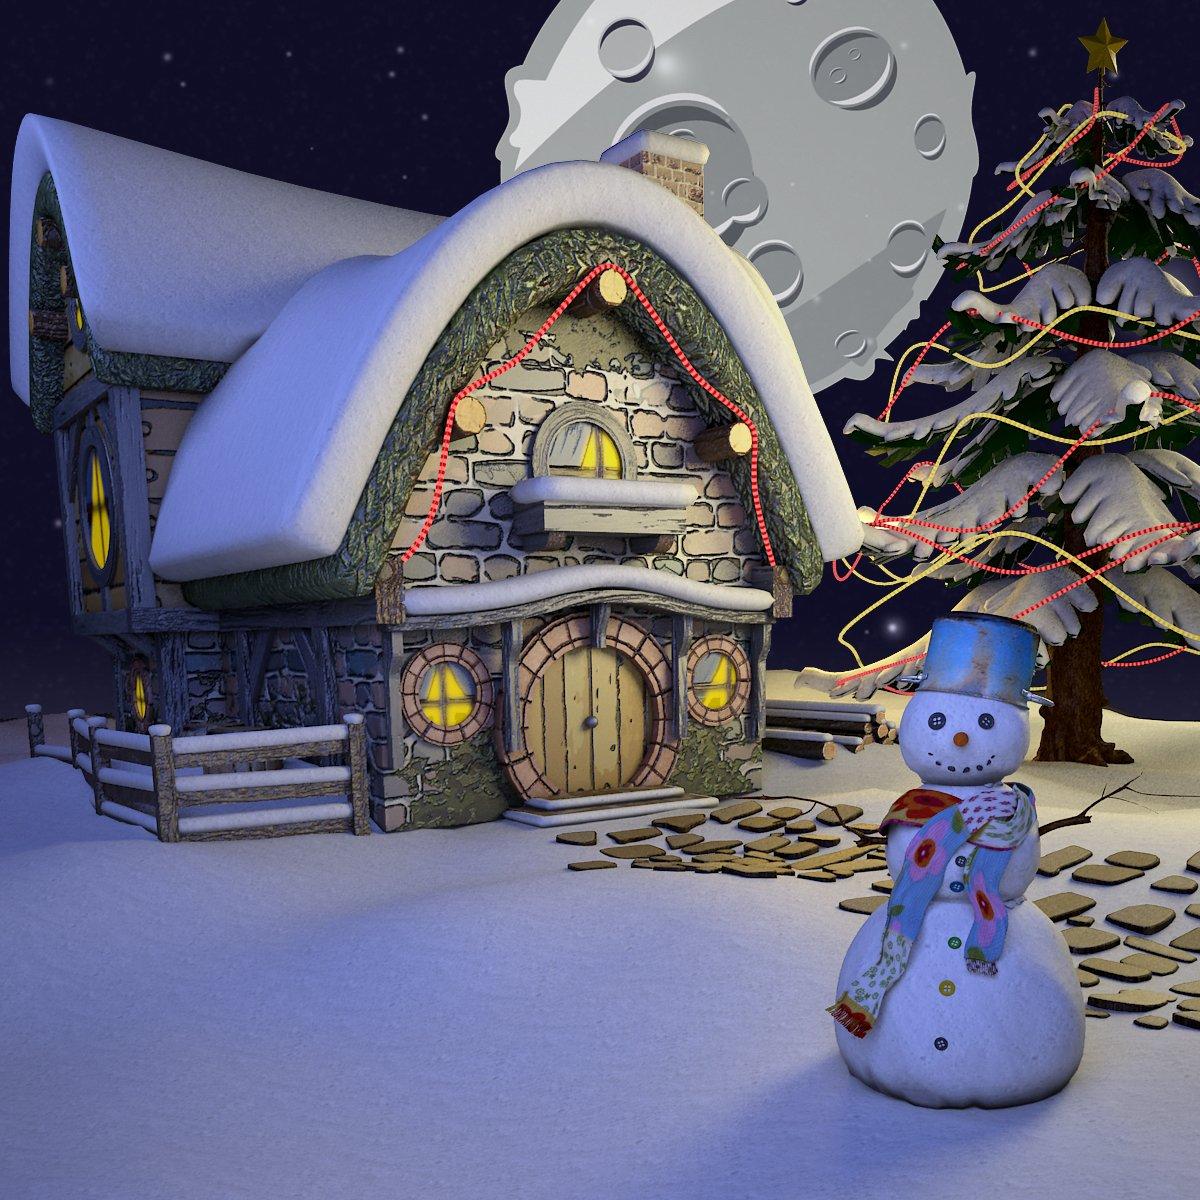 Cartoon Christmas Landscape Scene 3D Model in Fantasy 3DExport